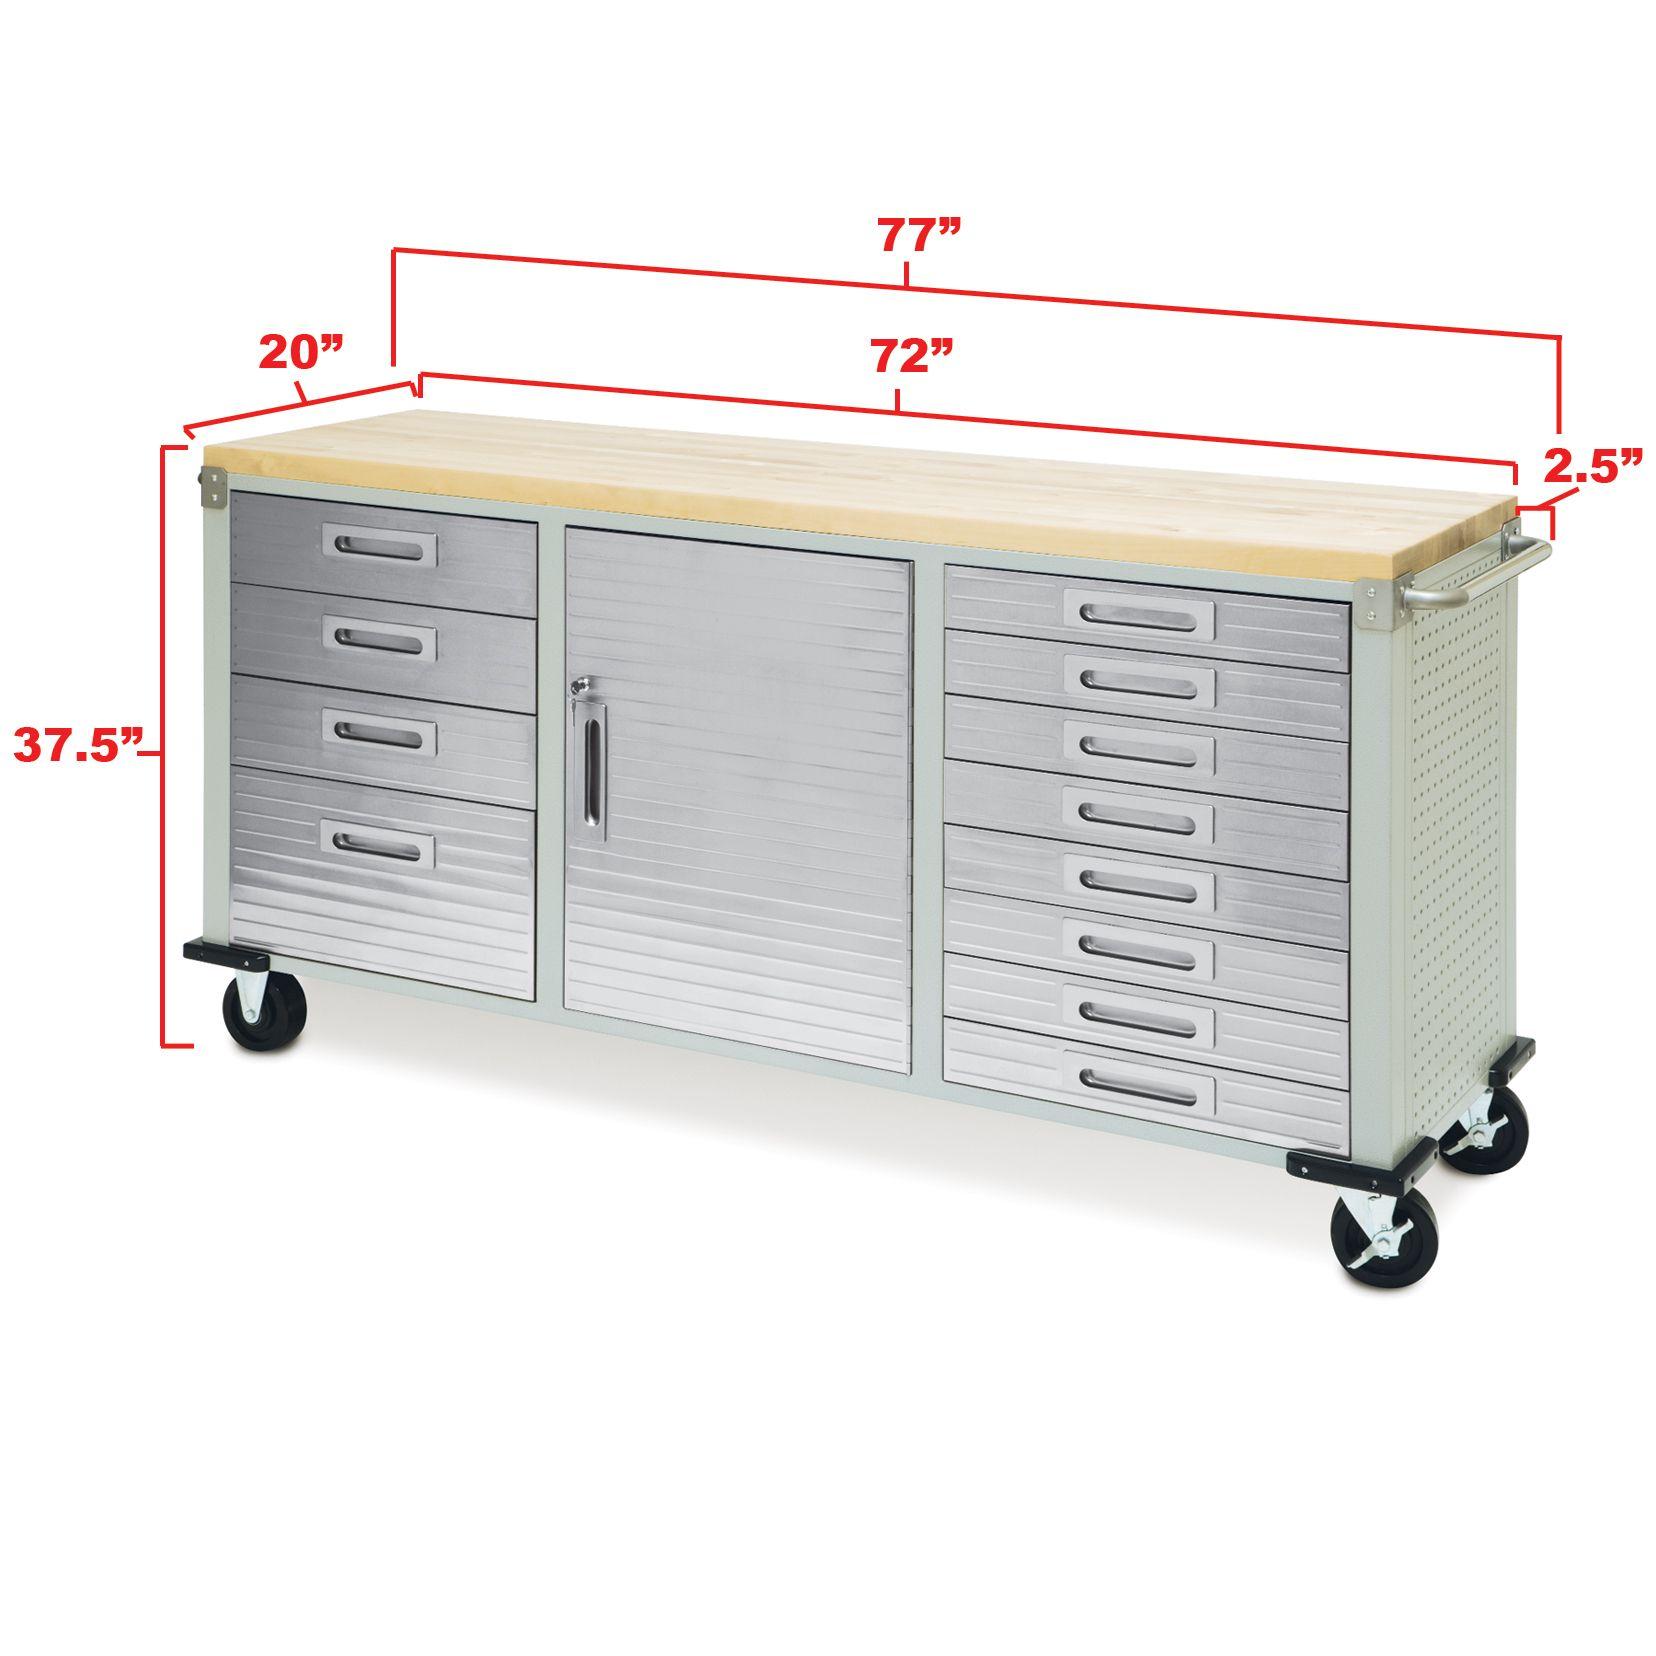 Seville Bench: 12 Drawer UltraHD Rolling Workbench